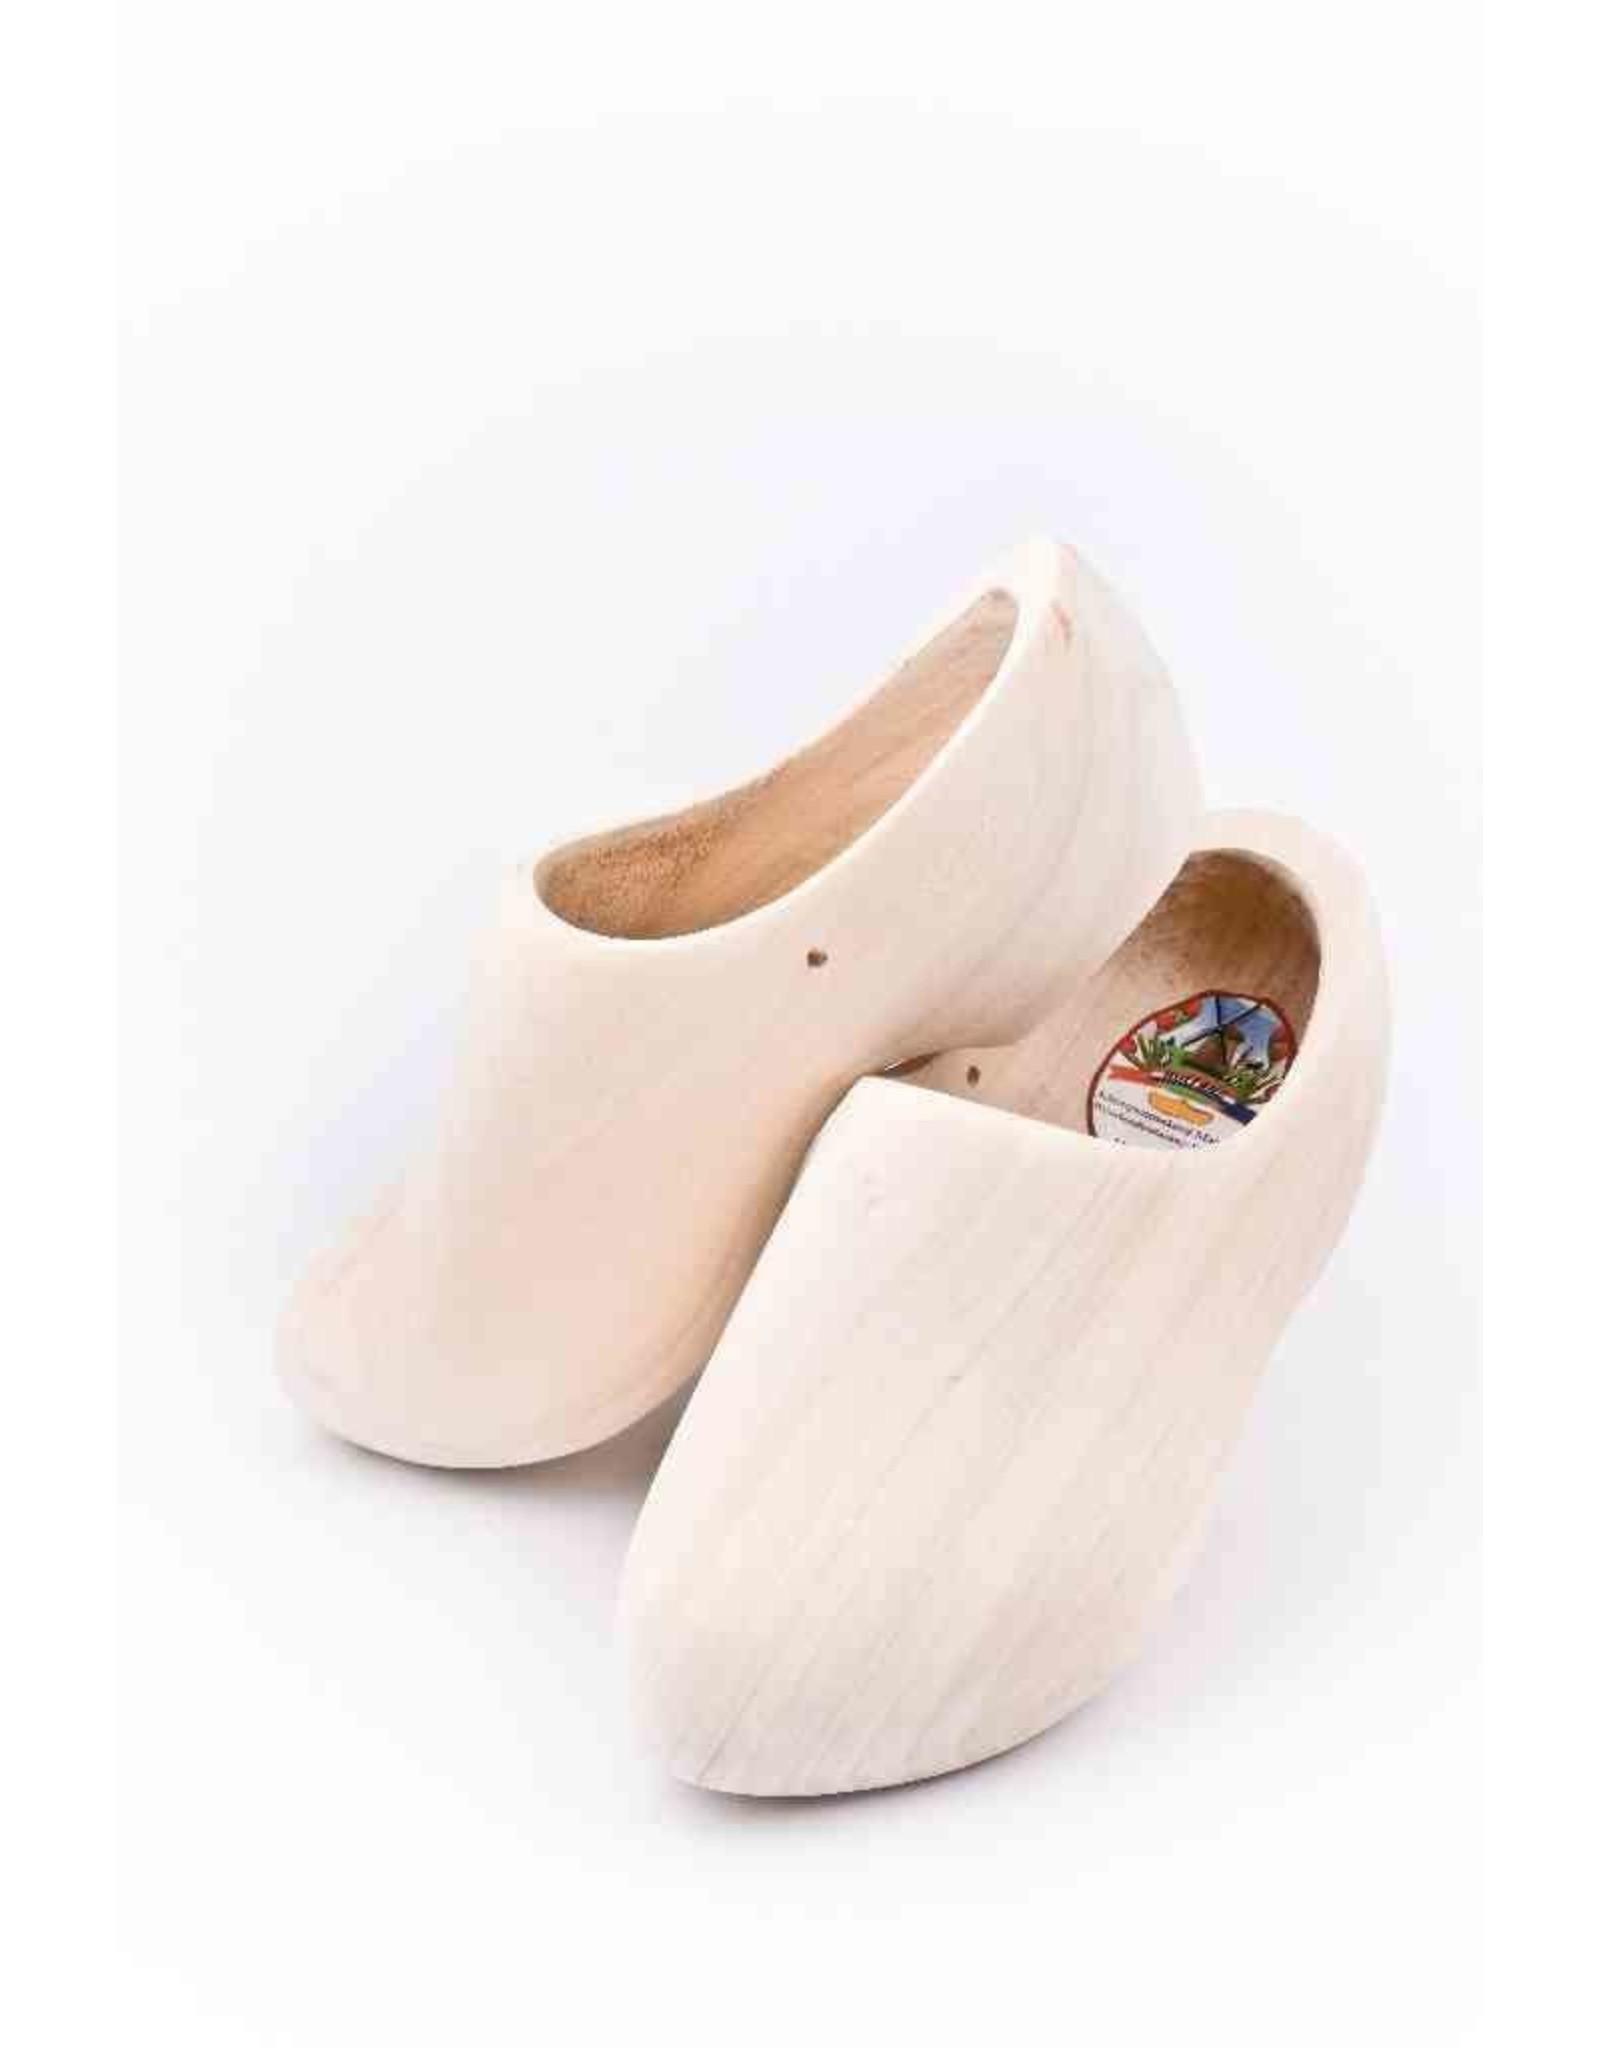 Wooden Shoe Factory Marken Wooden Shoes,  Plain Sanded